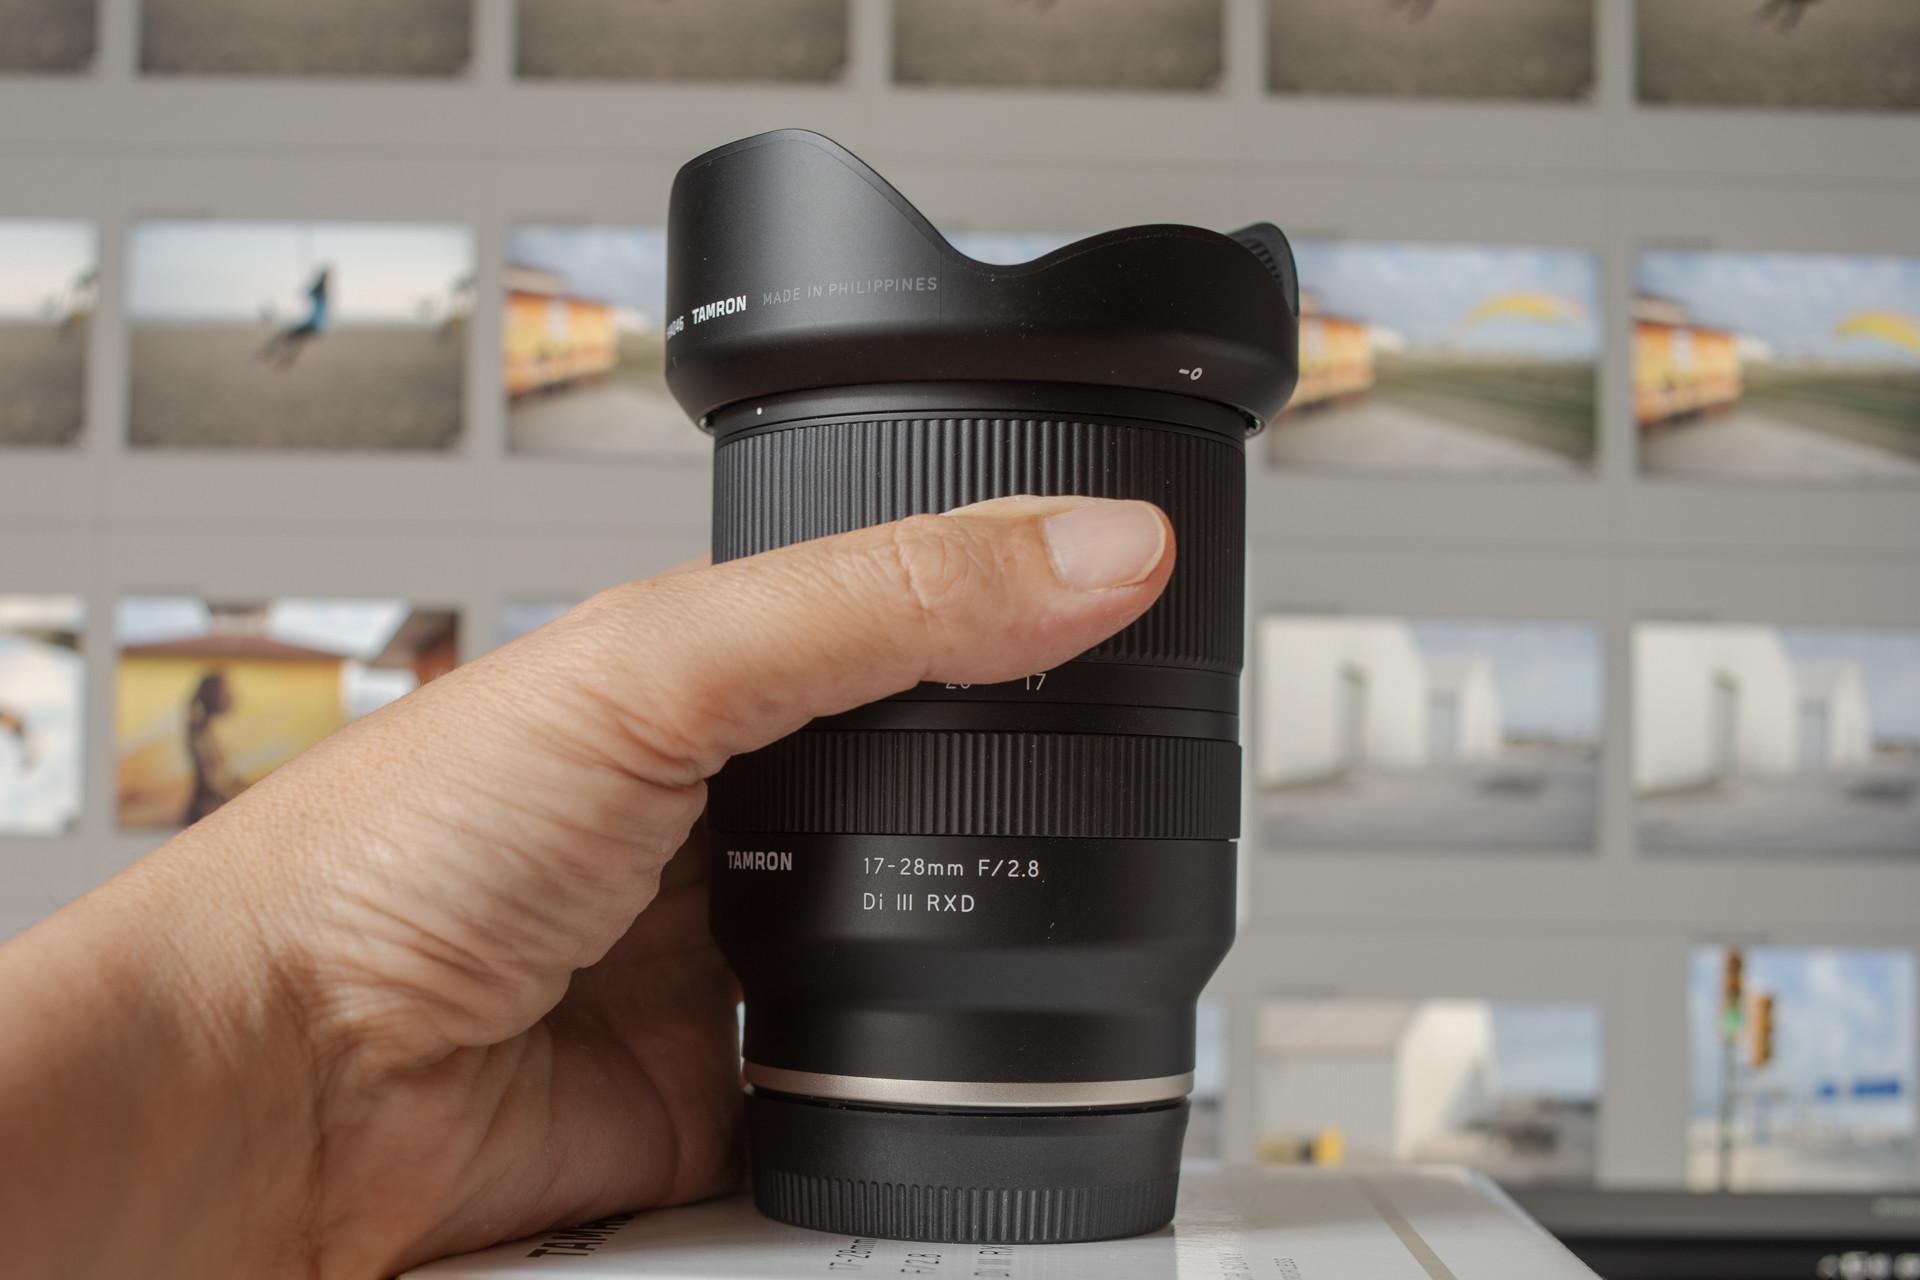 Fotografías del Tamron 17-28mm F/2.8 Di III RXD